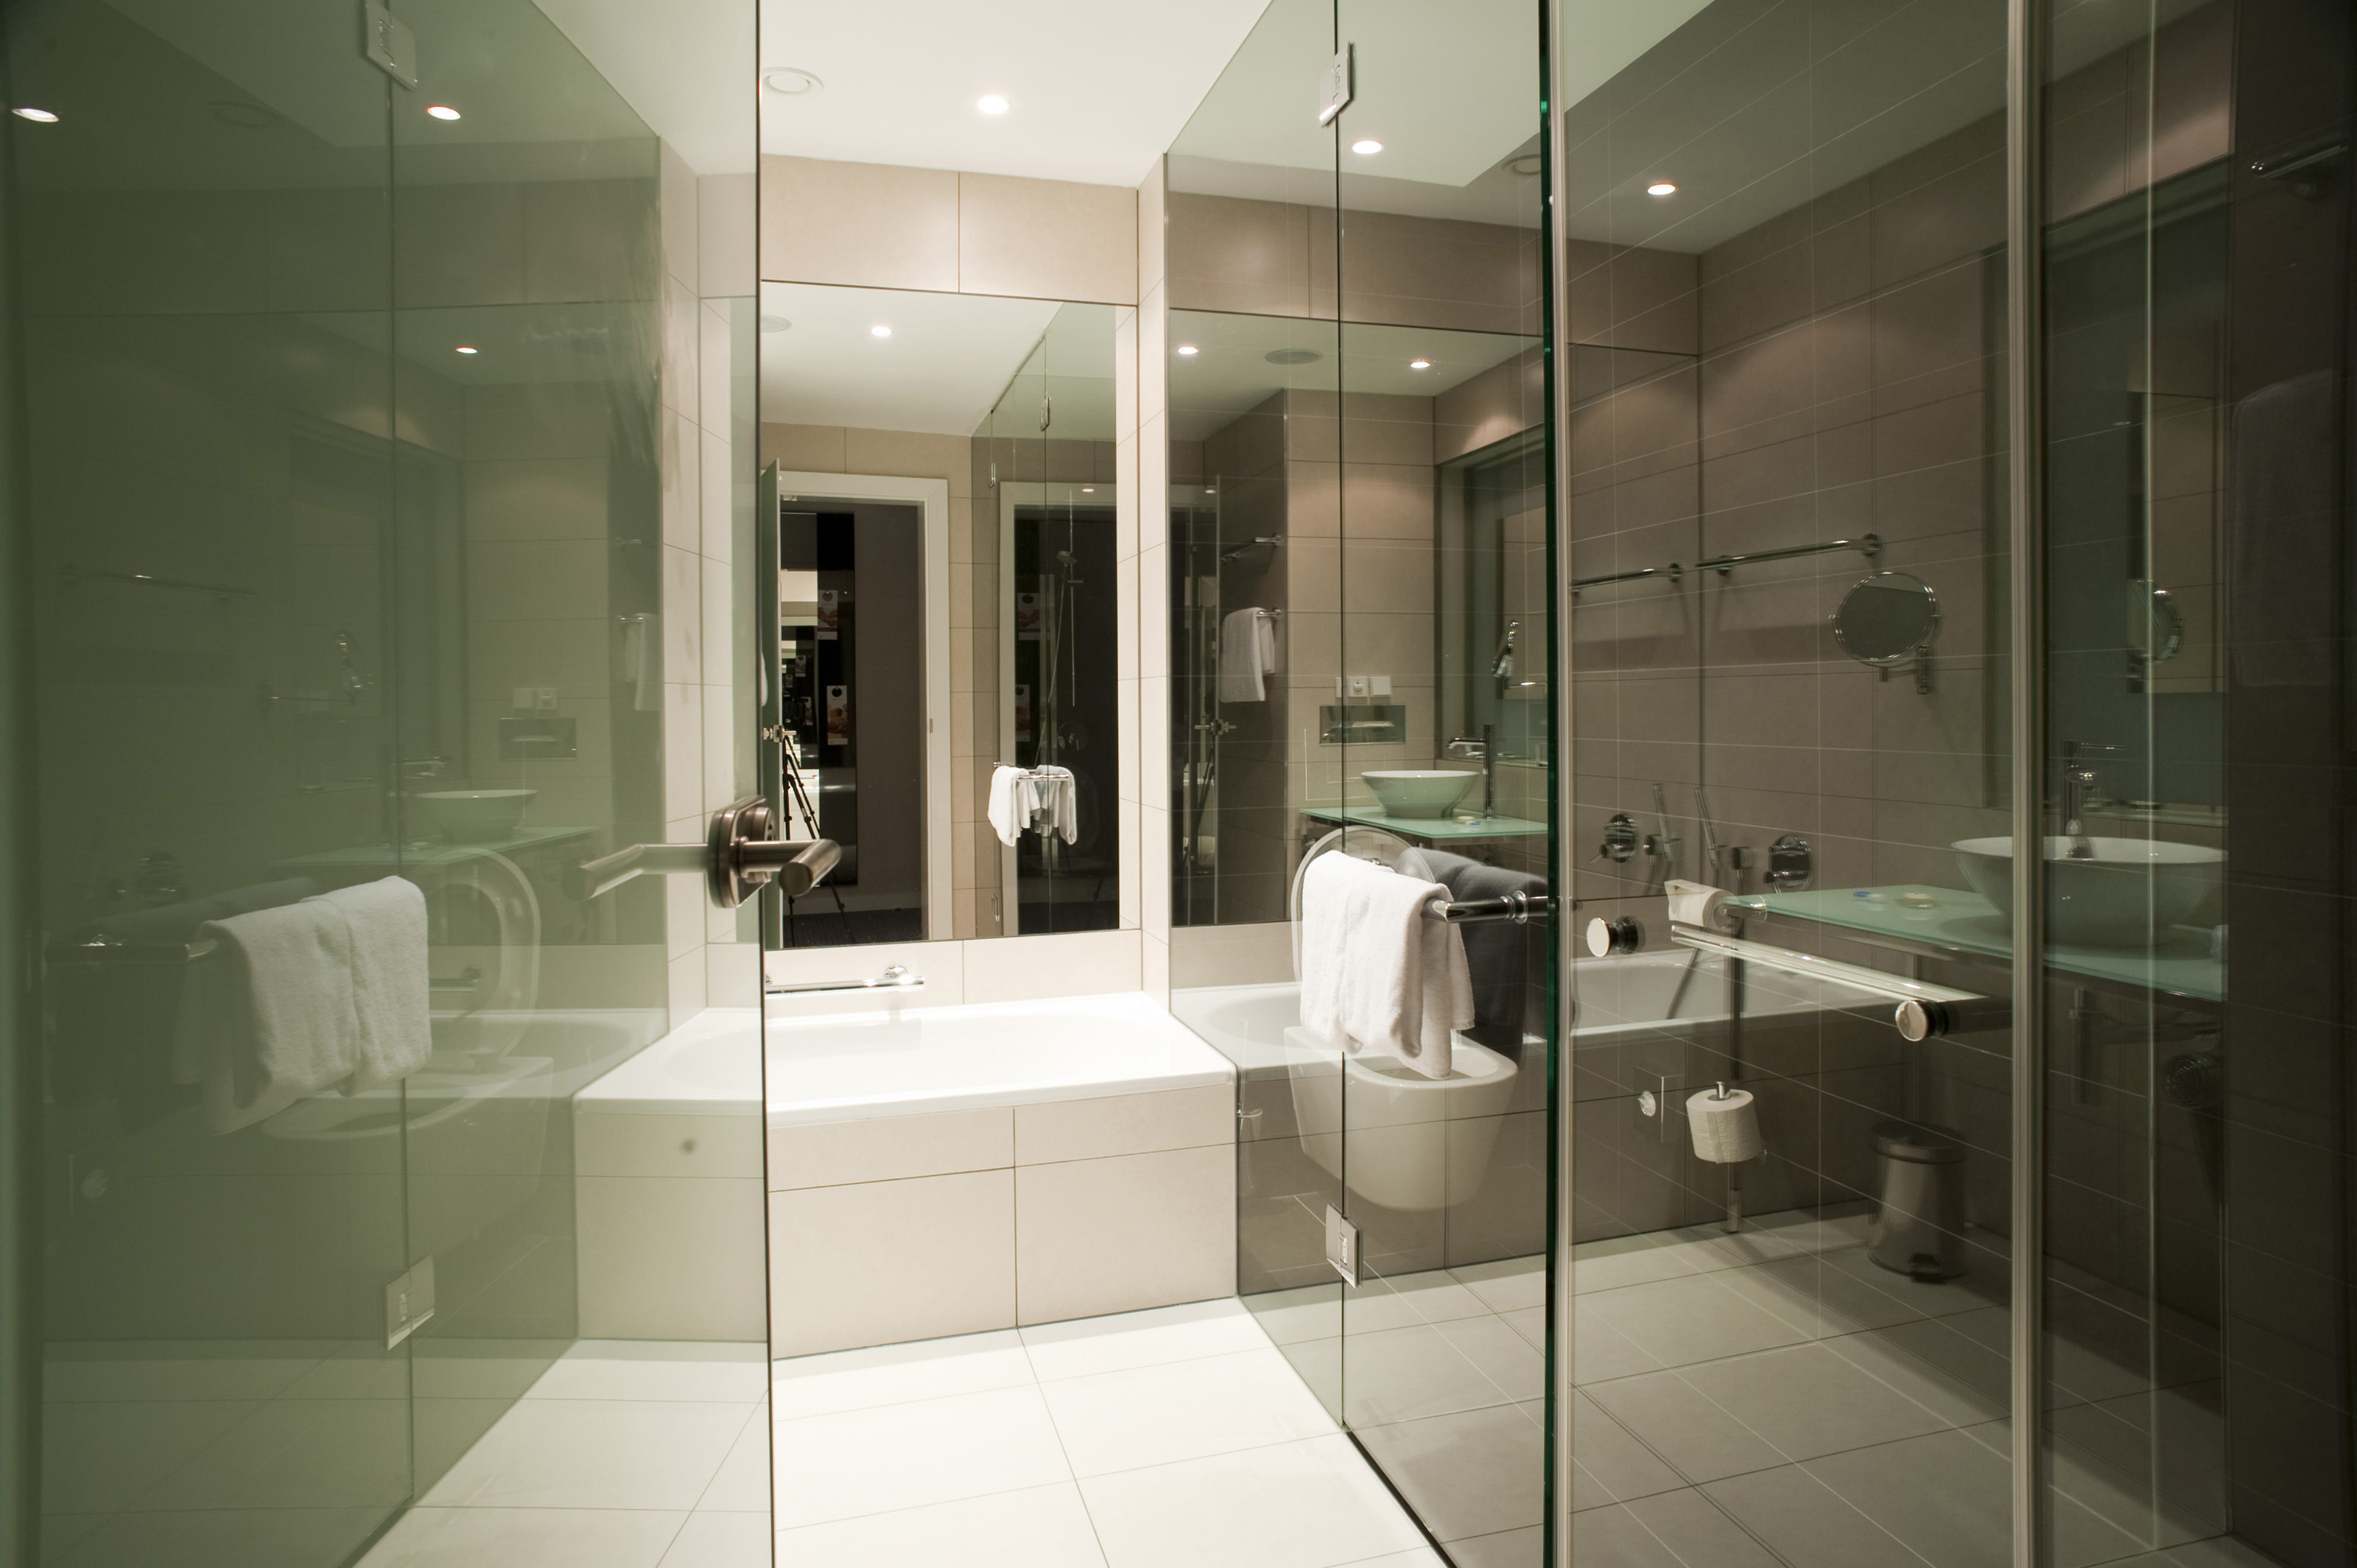 Free Stock Photo 6926 Modern bathroom | freeimageslive